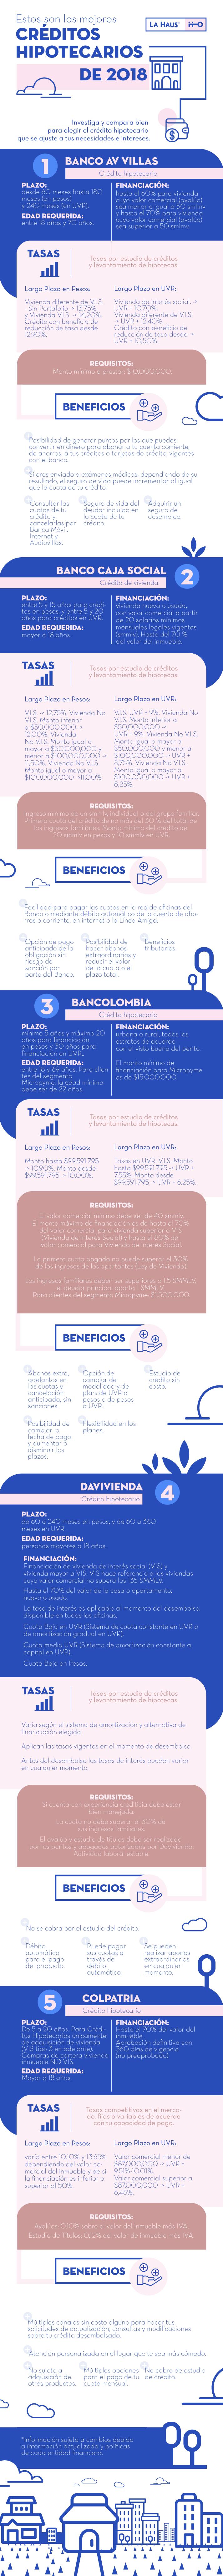 creditos-hipotecarios-2018